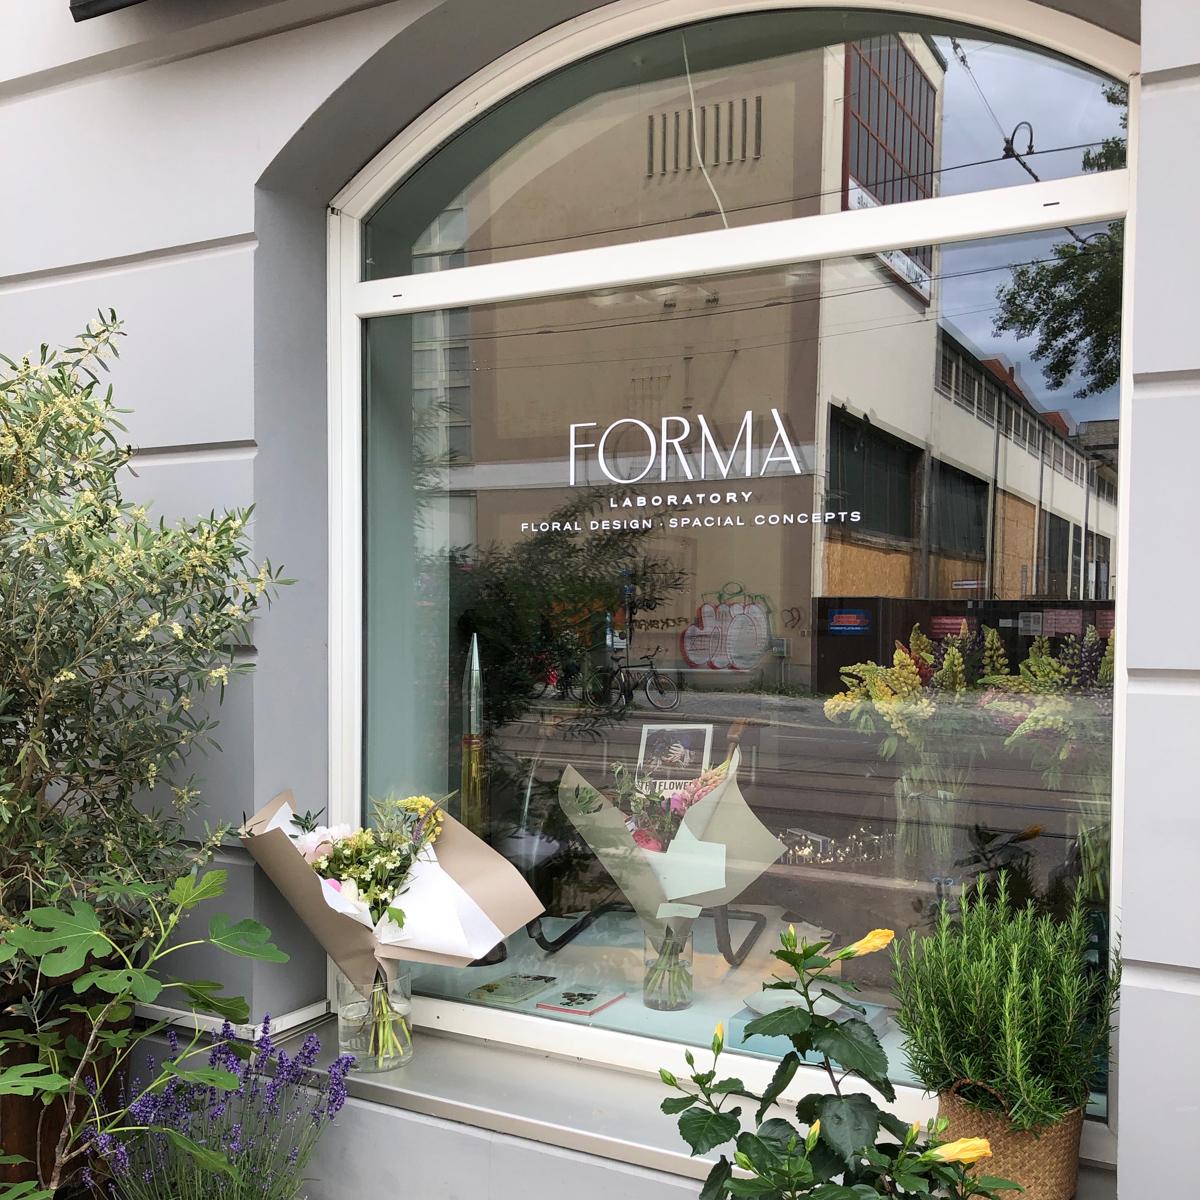 Forma Laboratoy Florist München-3